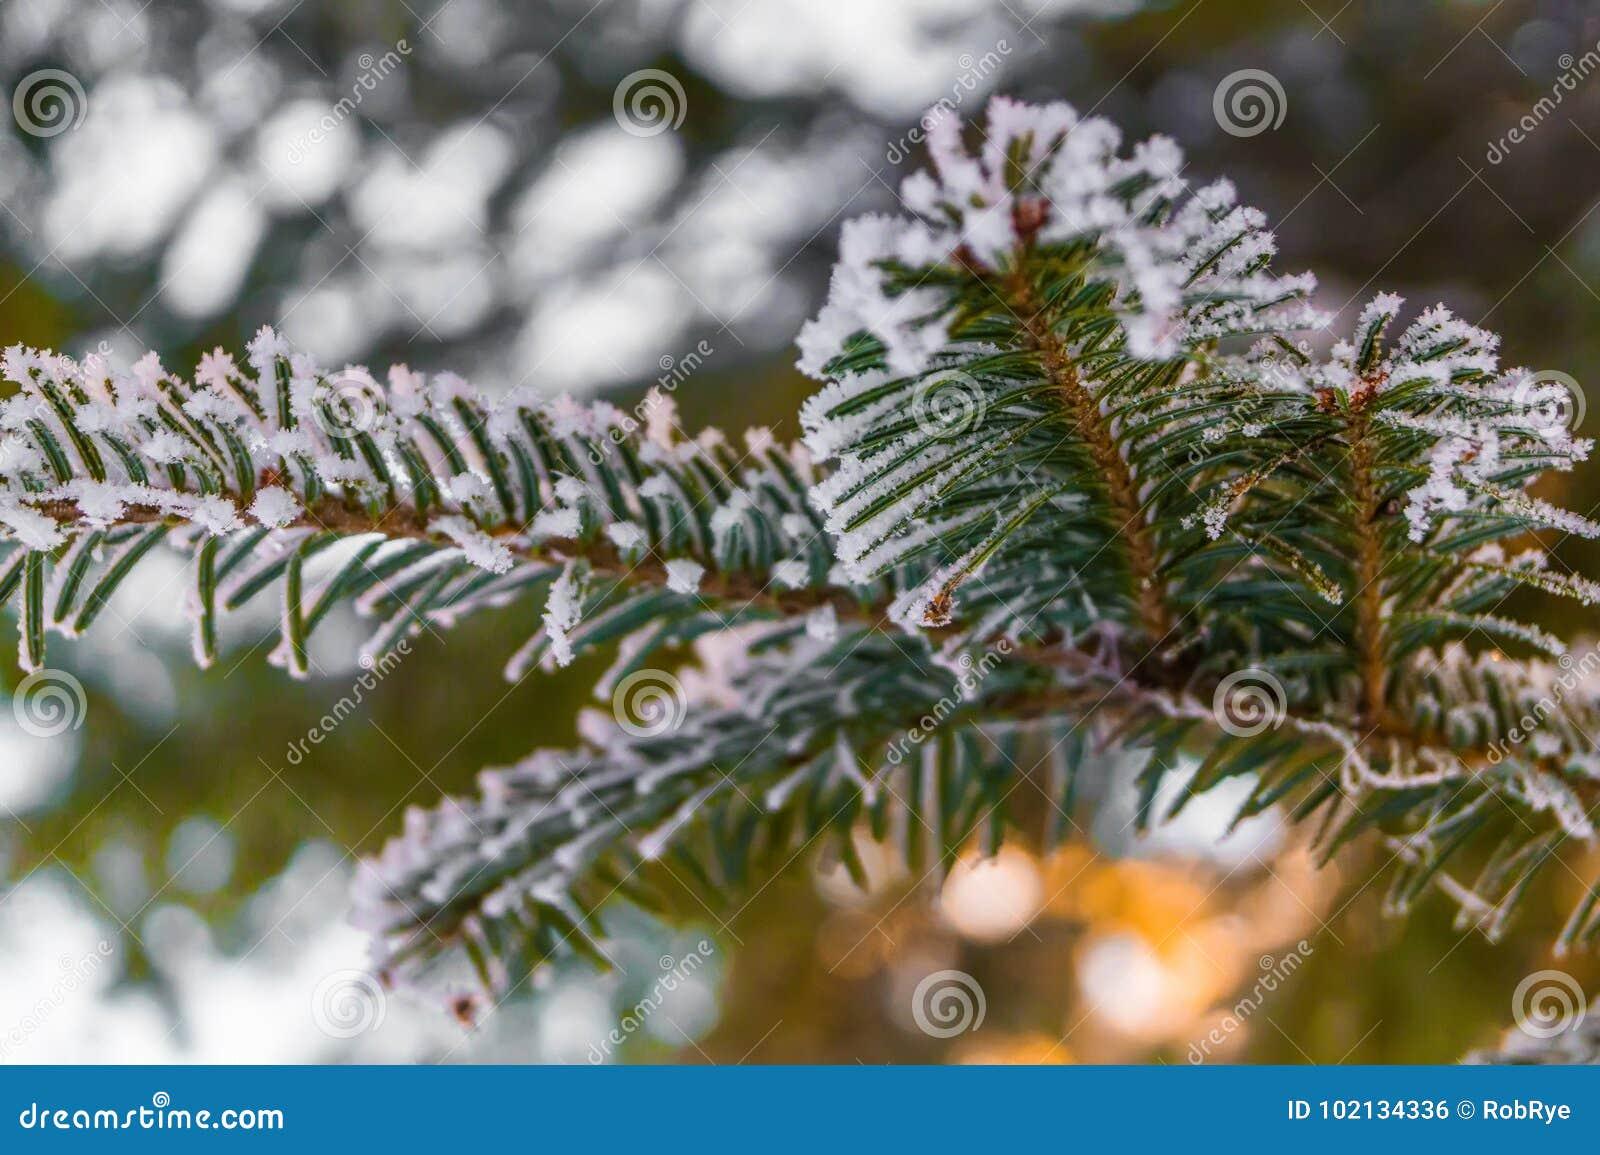 Dream Dream Fir, spruce, what dreams of Fir, spruce in a dream to see 11